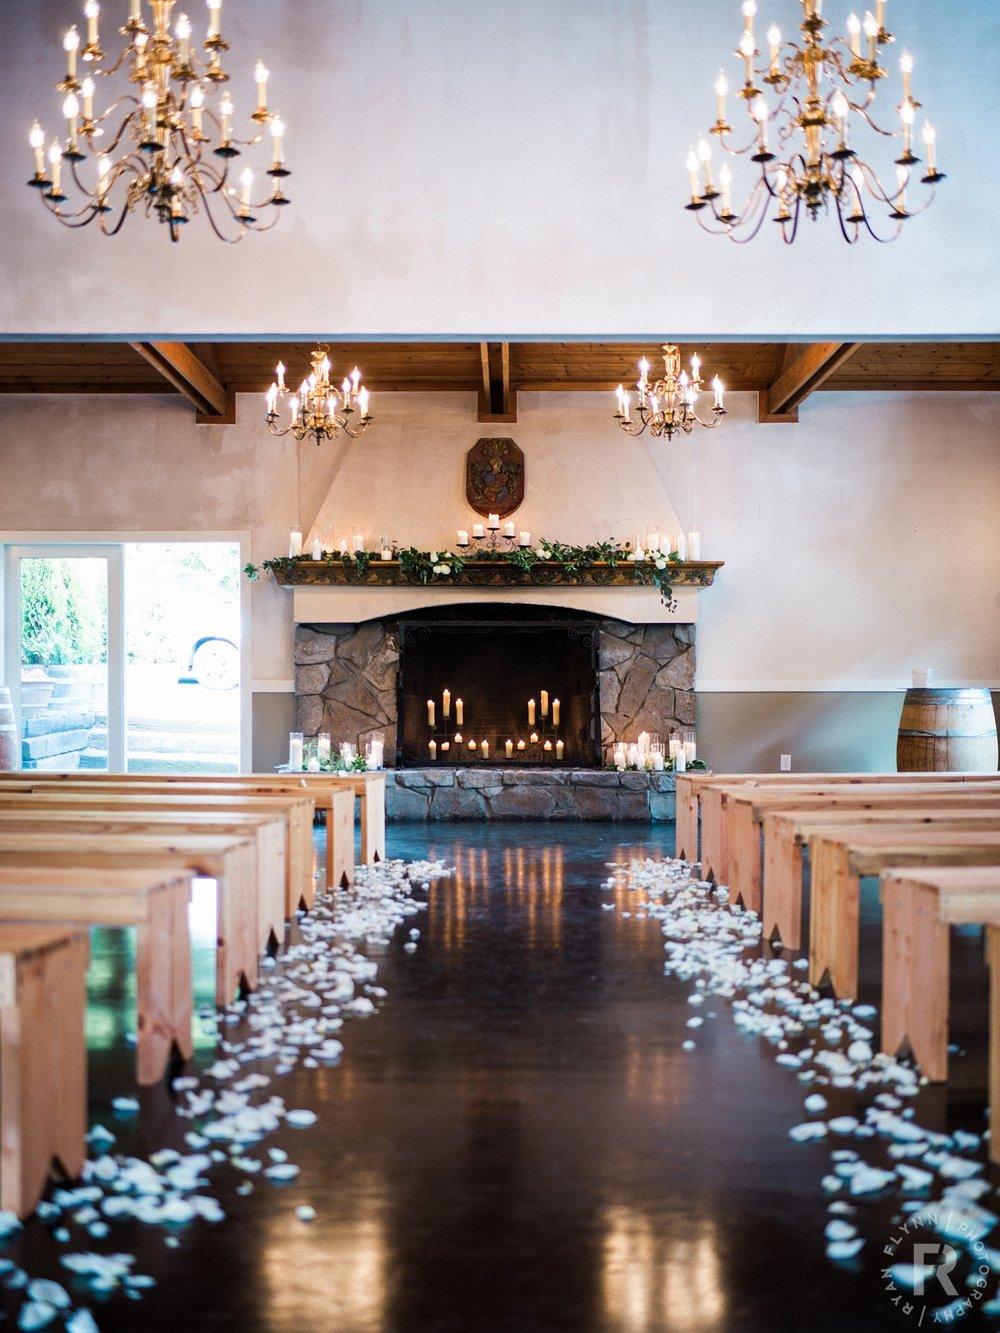 paulinebrent-ryan-flynn-delille-cellars-chateau-wedding-details-0023.JPG